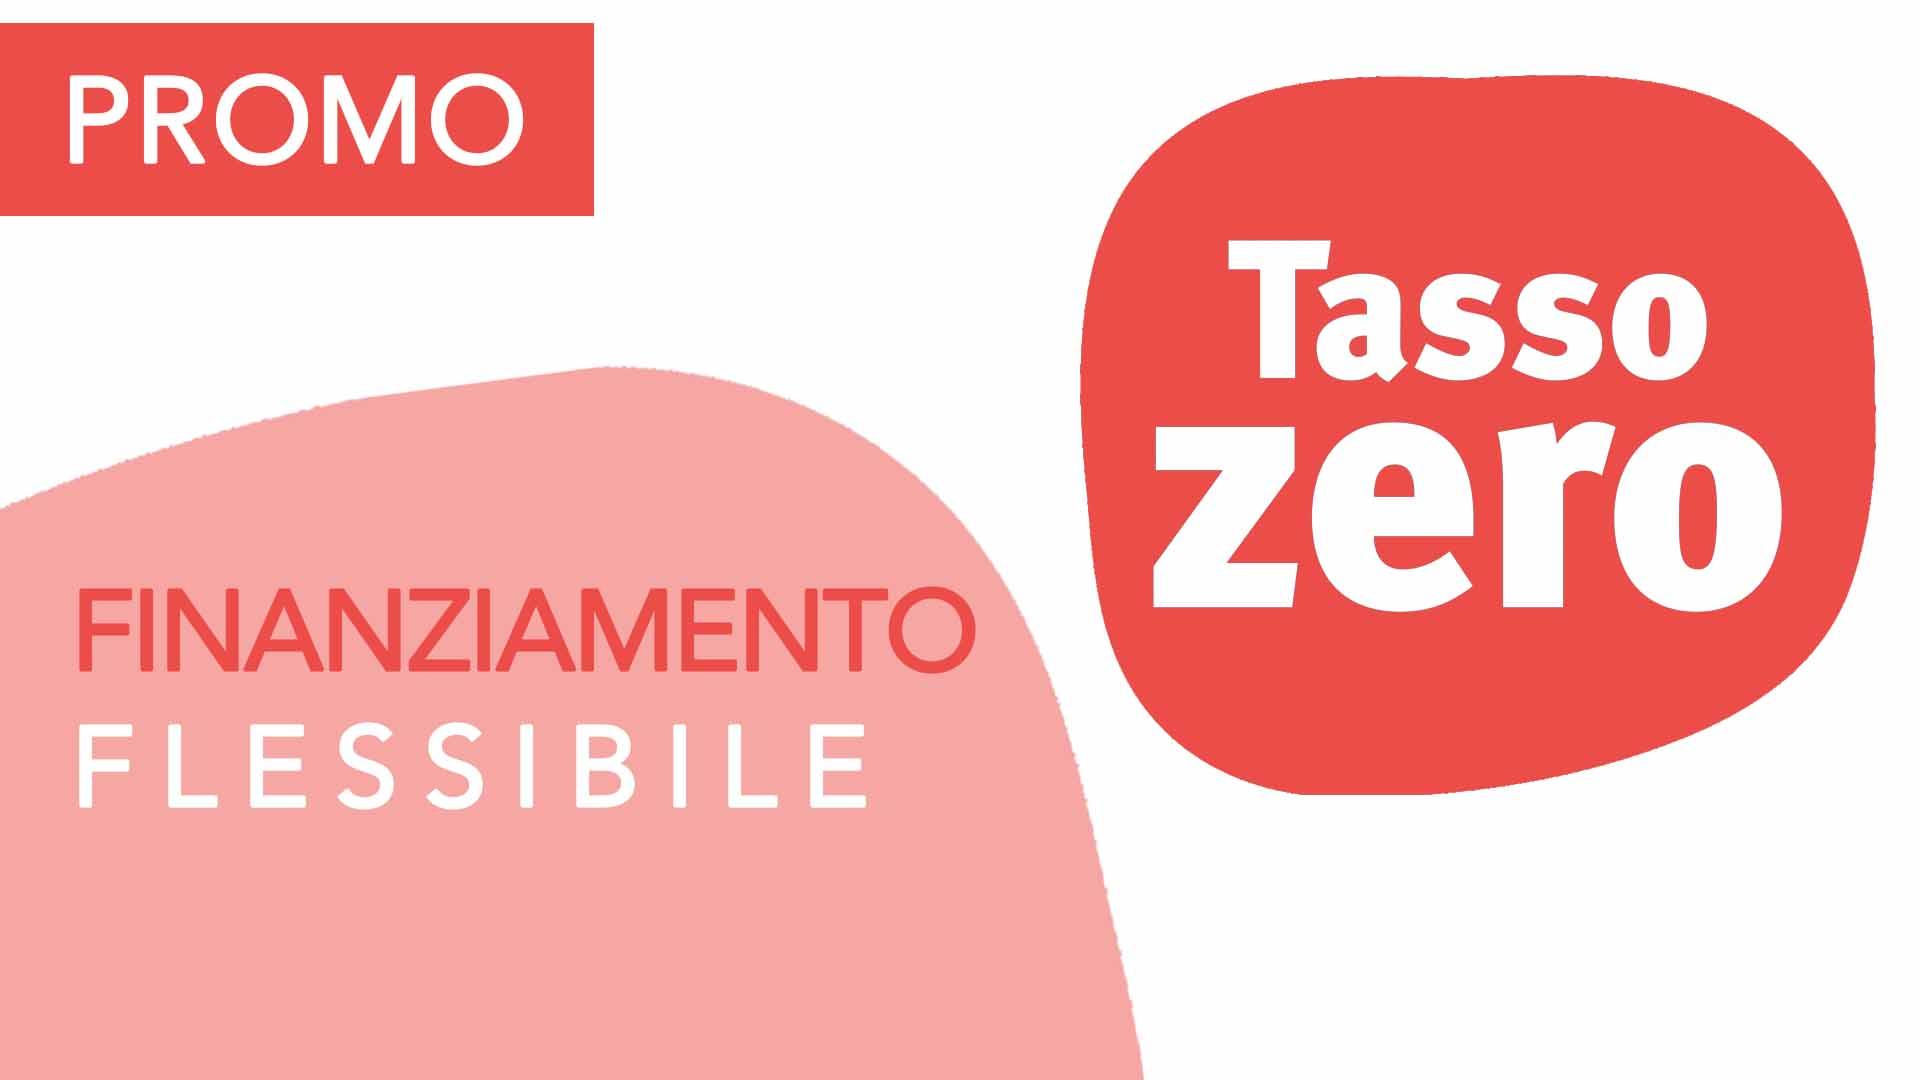 Promo Tasso Zero